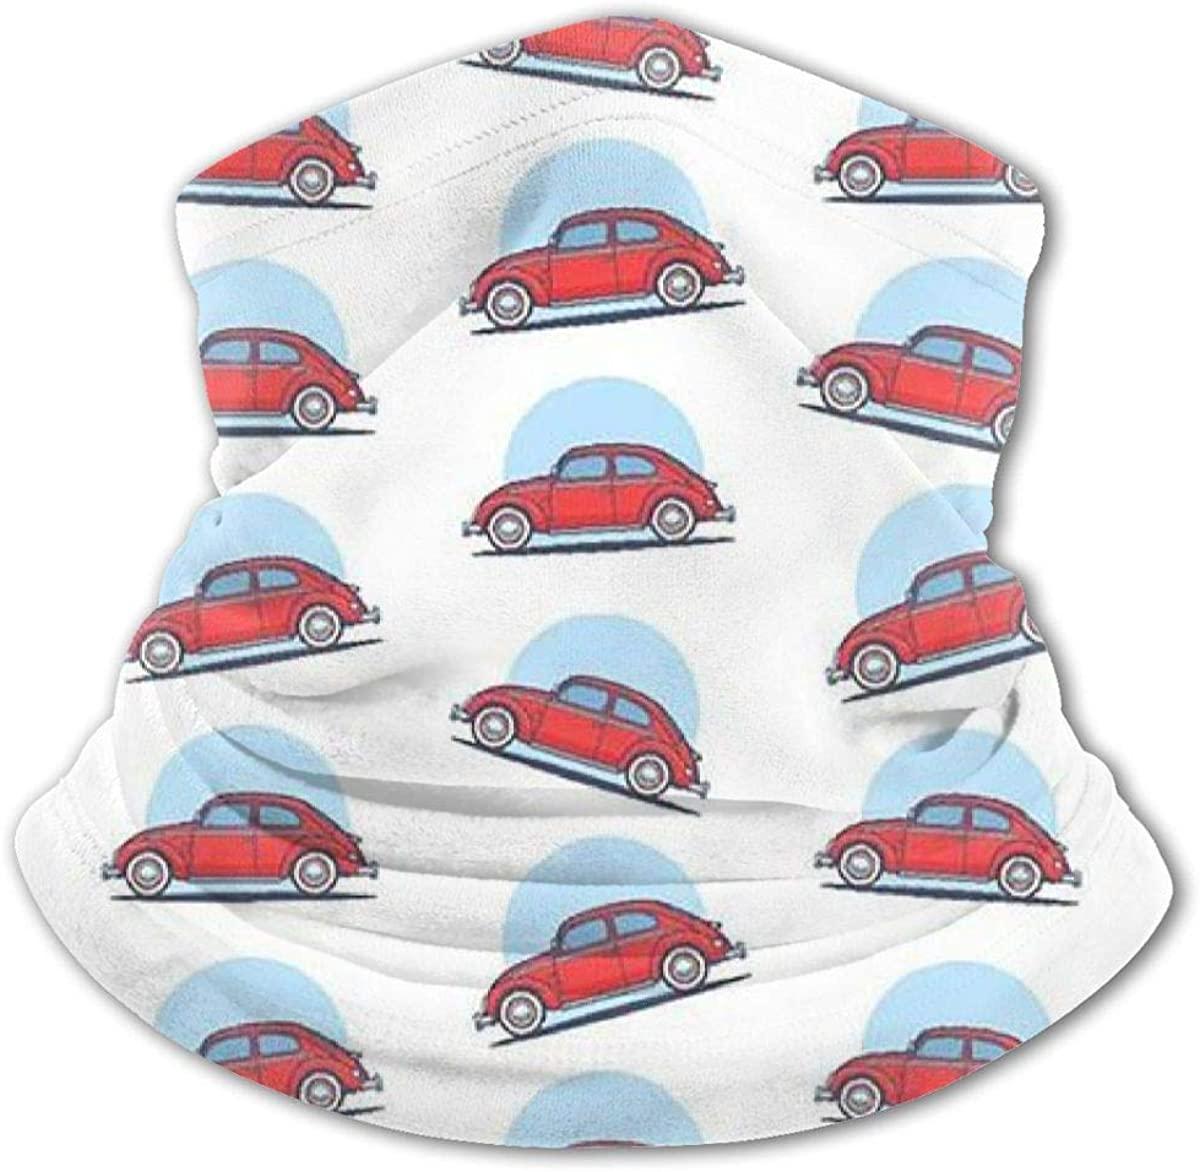 Cartoon Car Headwear For Girls And Boys, Head Wrap, Neck Gaiter, Headband, Tenn Fishing Mask, Magic Scarf, Tube Mask, Face Bandana Mask For Camping Running Cycling